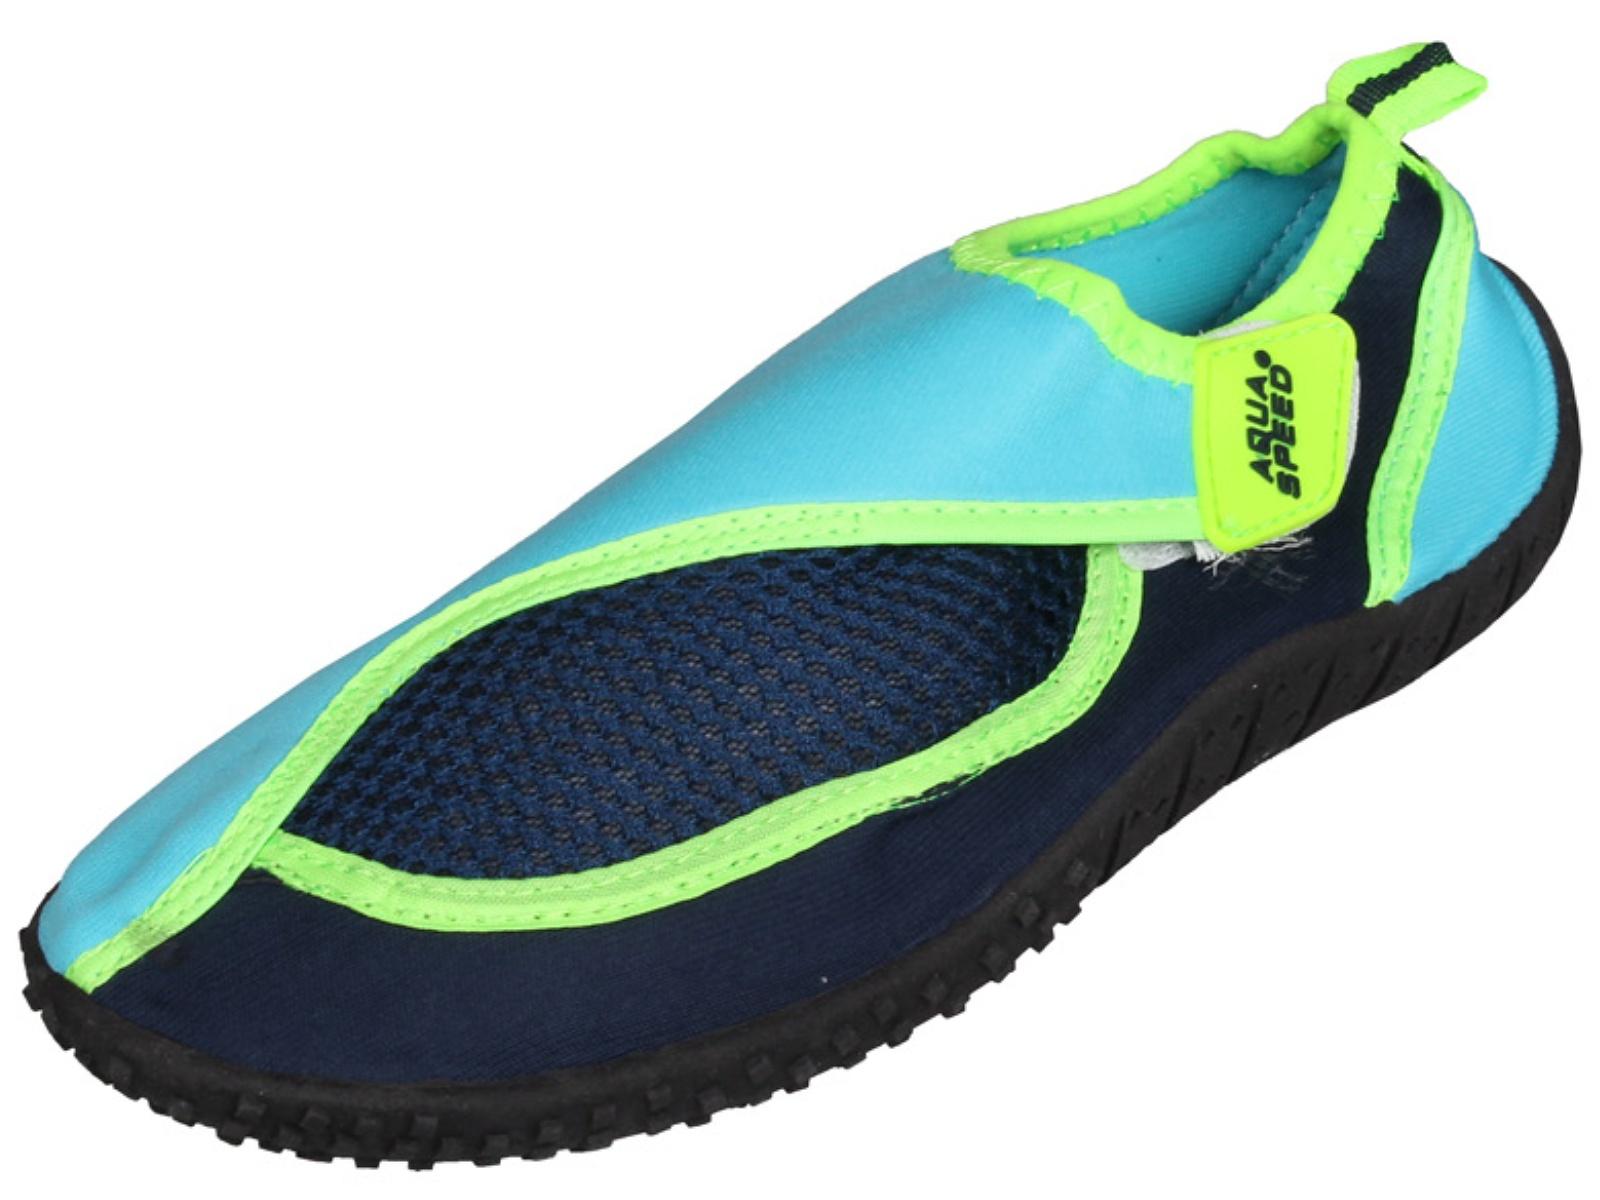 Topánky do vody AQUA-SPEED 26B detské modré - veľ. 23